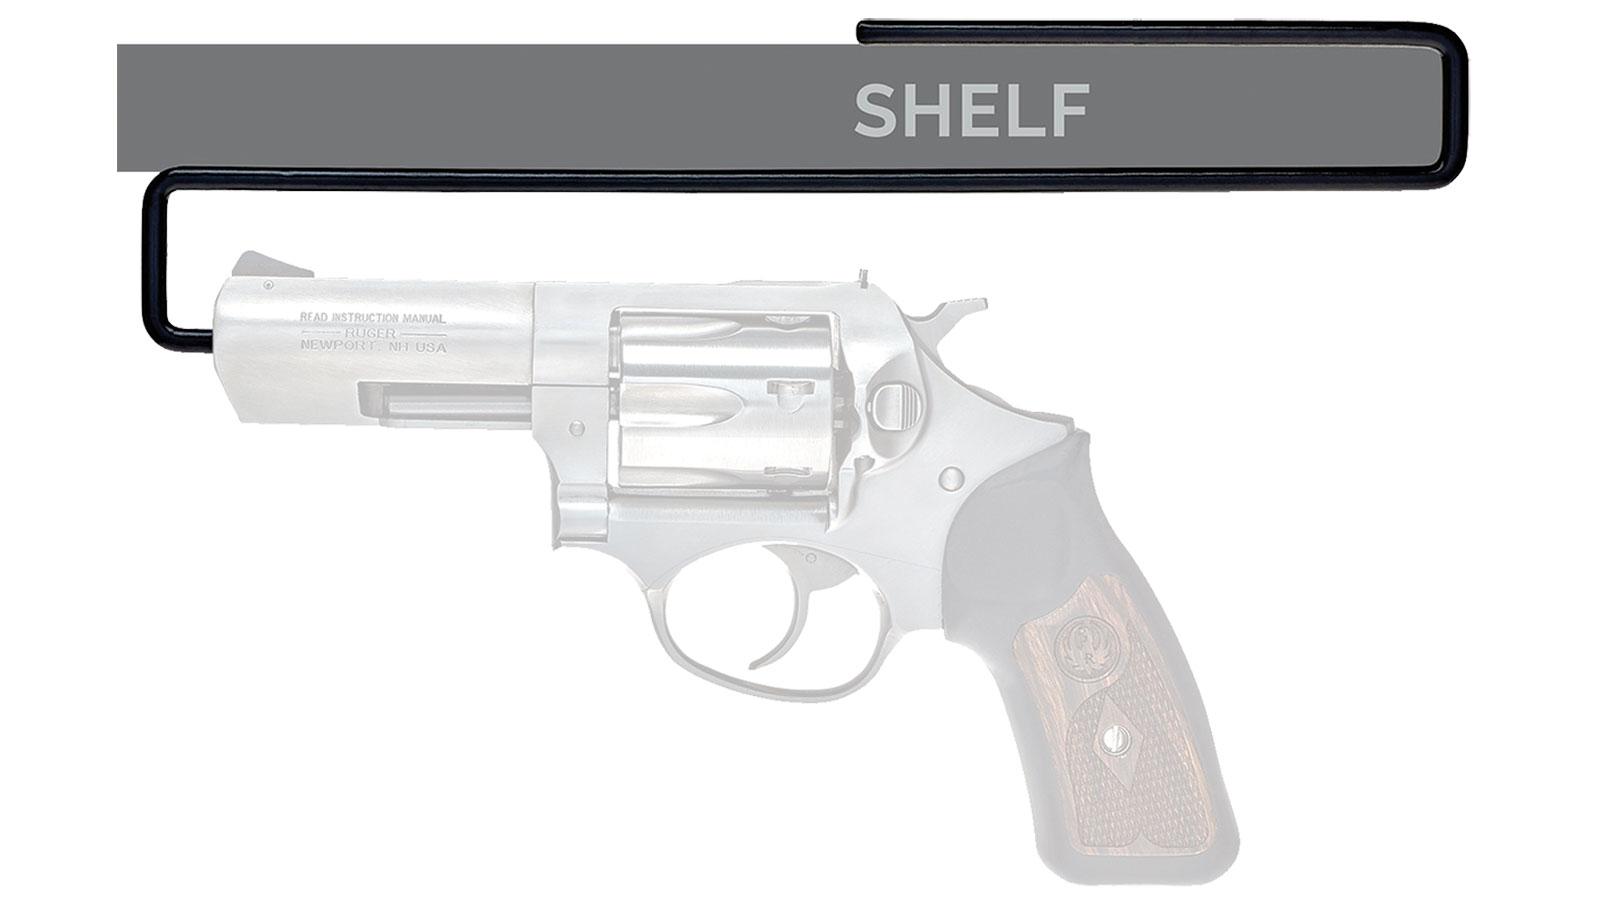 SnapSafe 75874 Handgun Hanger 44 Caliber Handgun Steel Black